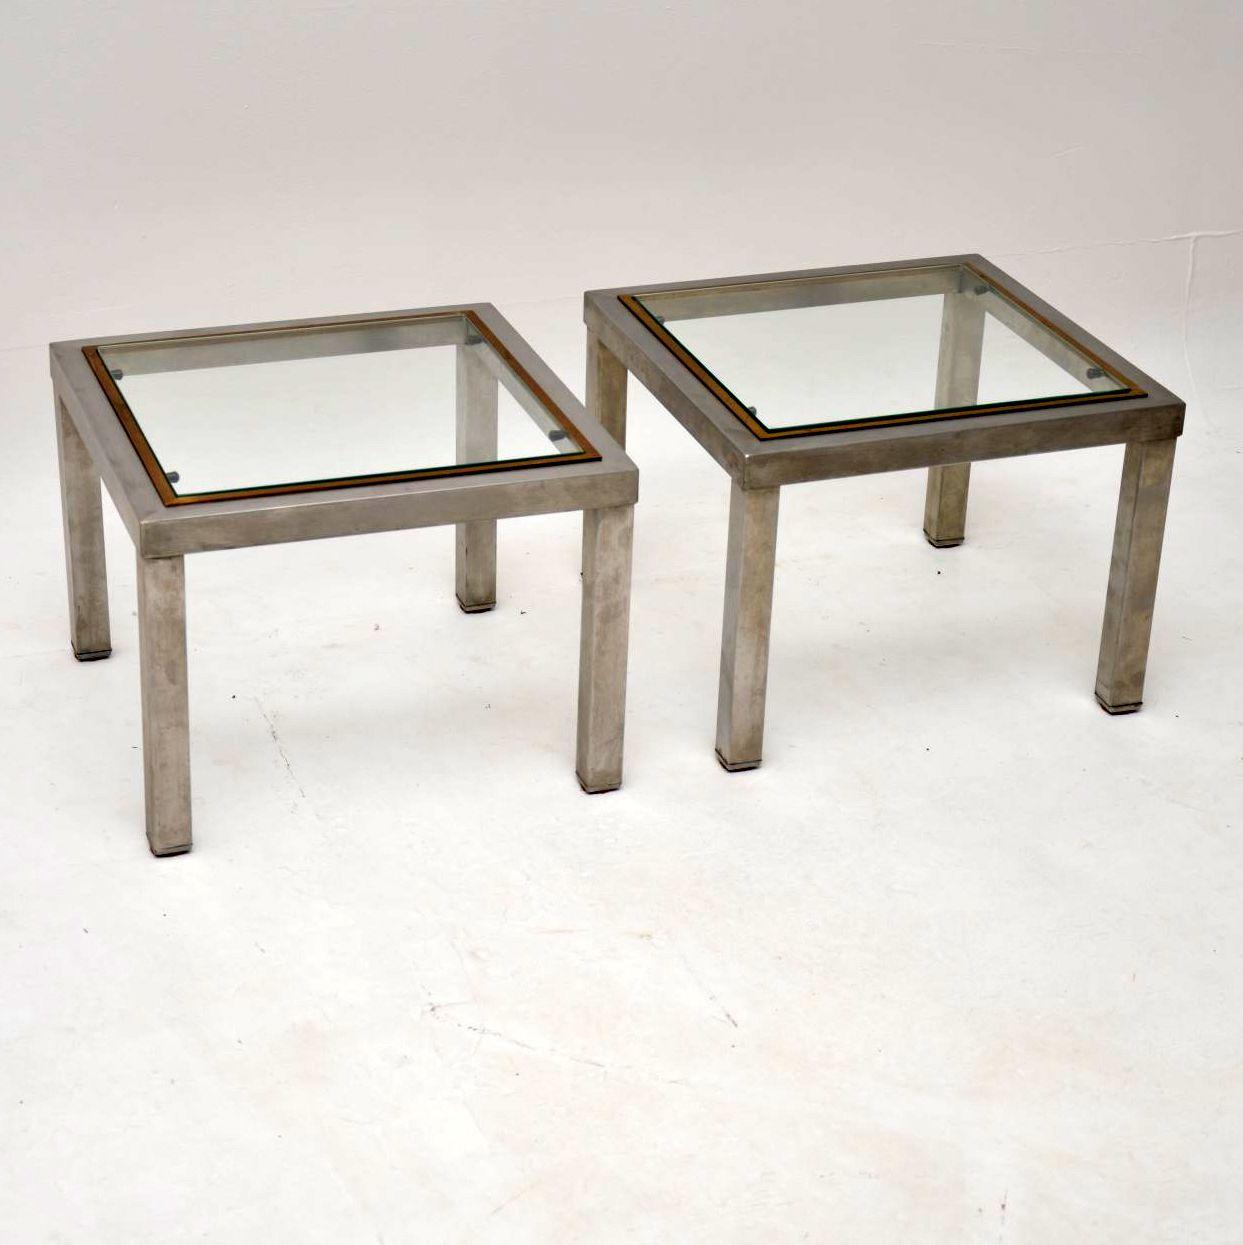 retro_chrome_brass_nestring_coffee_table_7